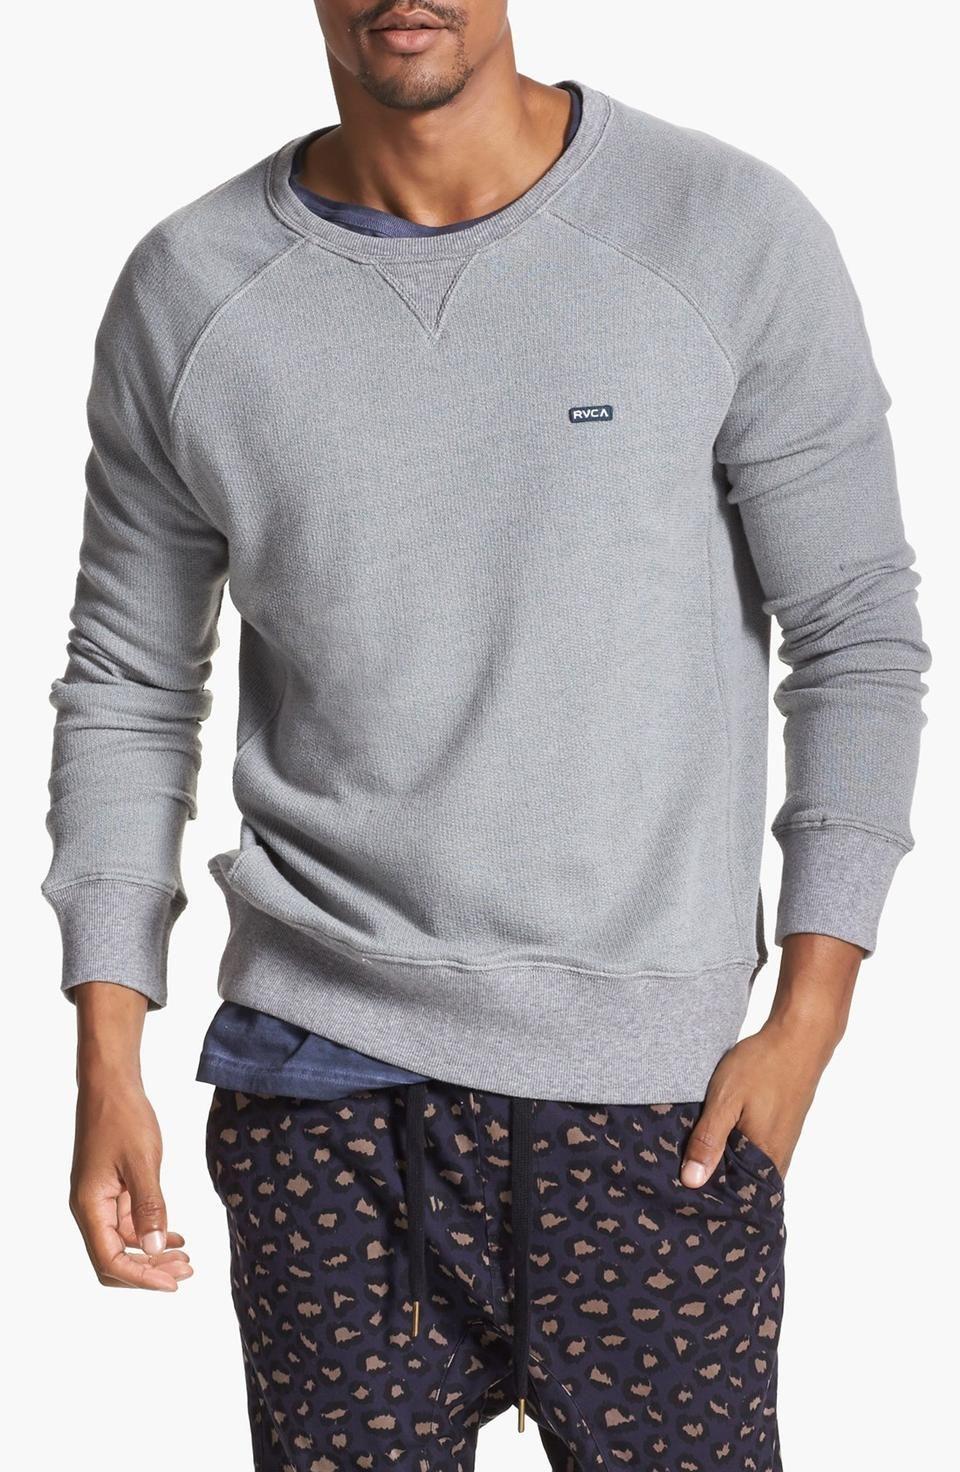 Rvca Captured Crewneck Sweatshirt For 50 Wantering Grey Sweatshirt Mens Sick Clothes Simple Sweatshirt [ 1472 x 960 Pixel ]